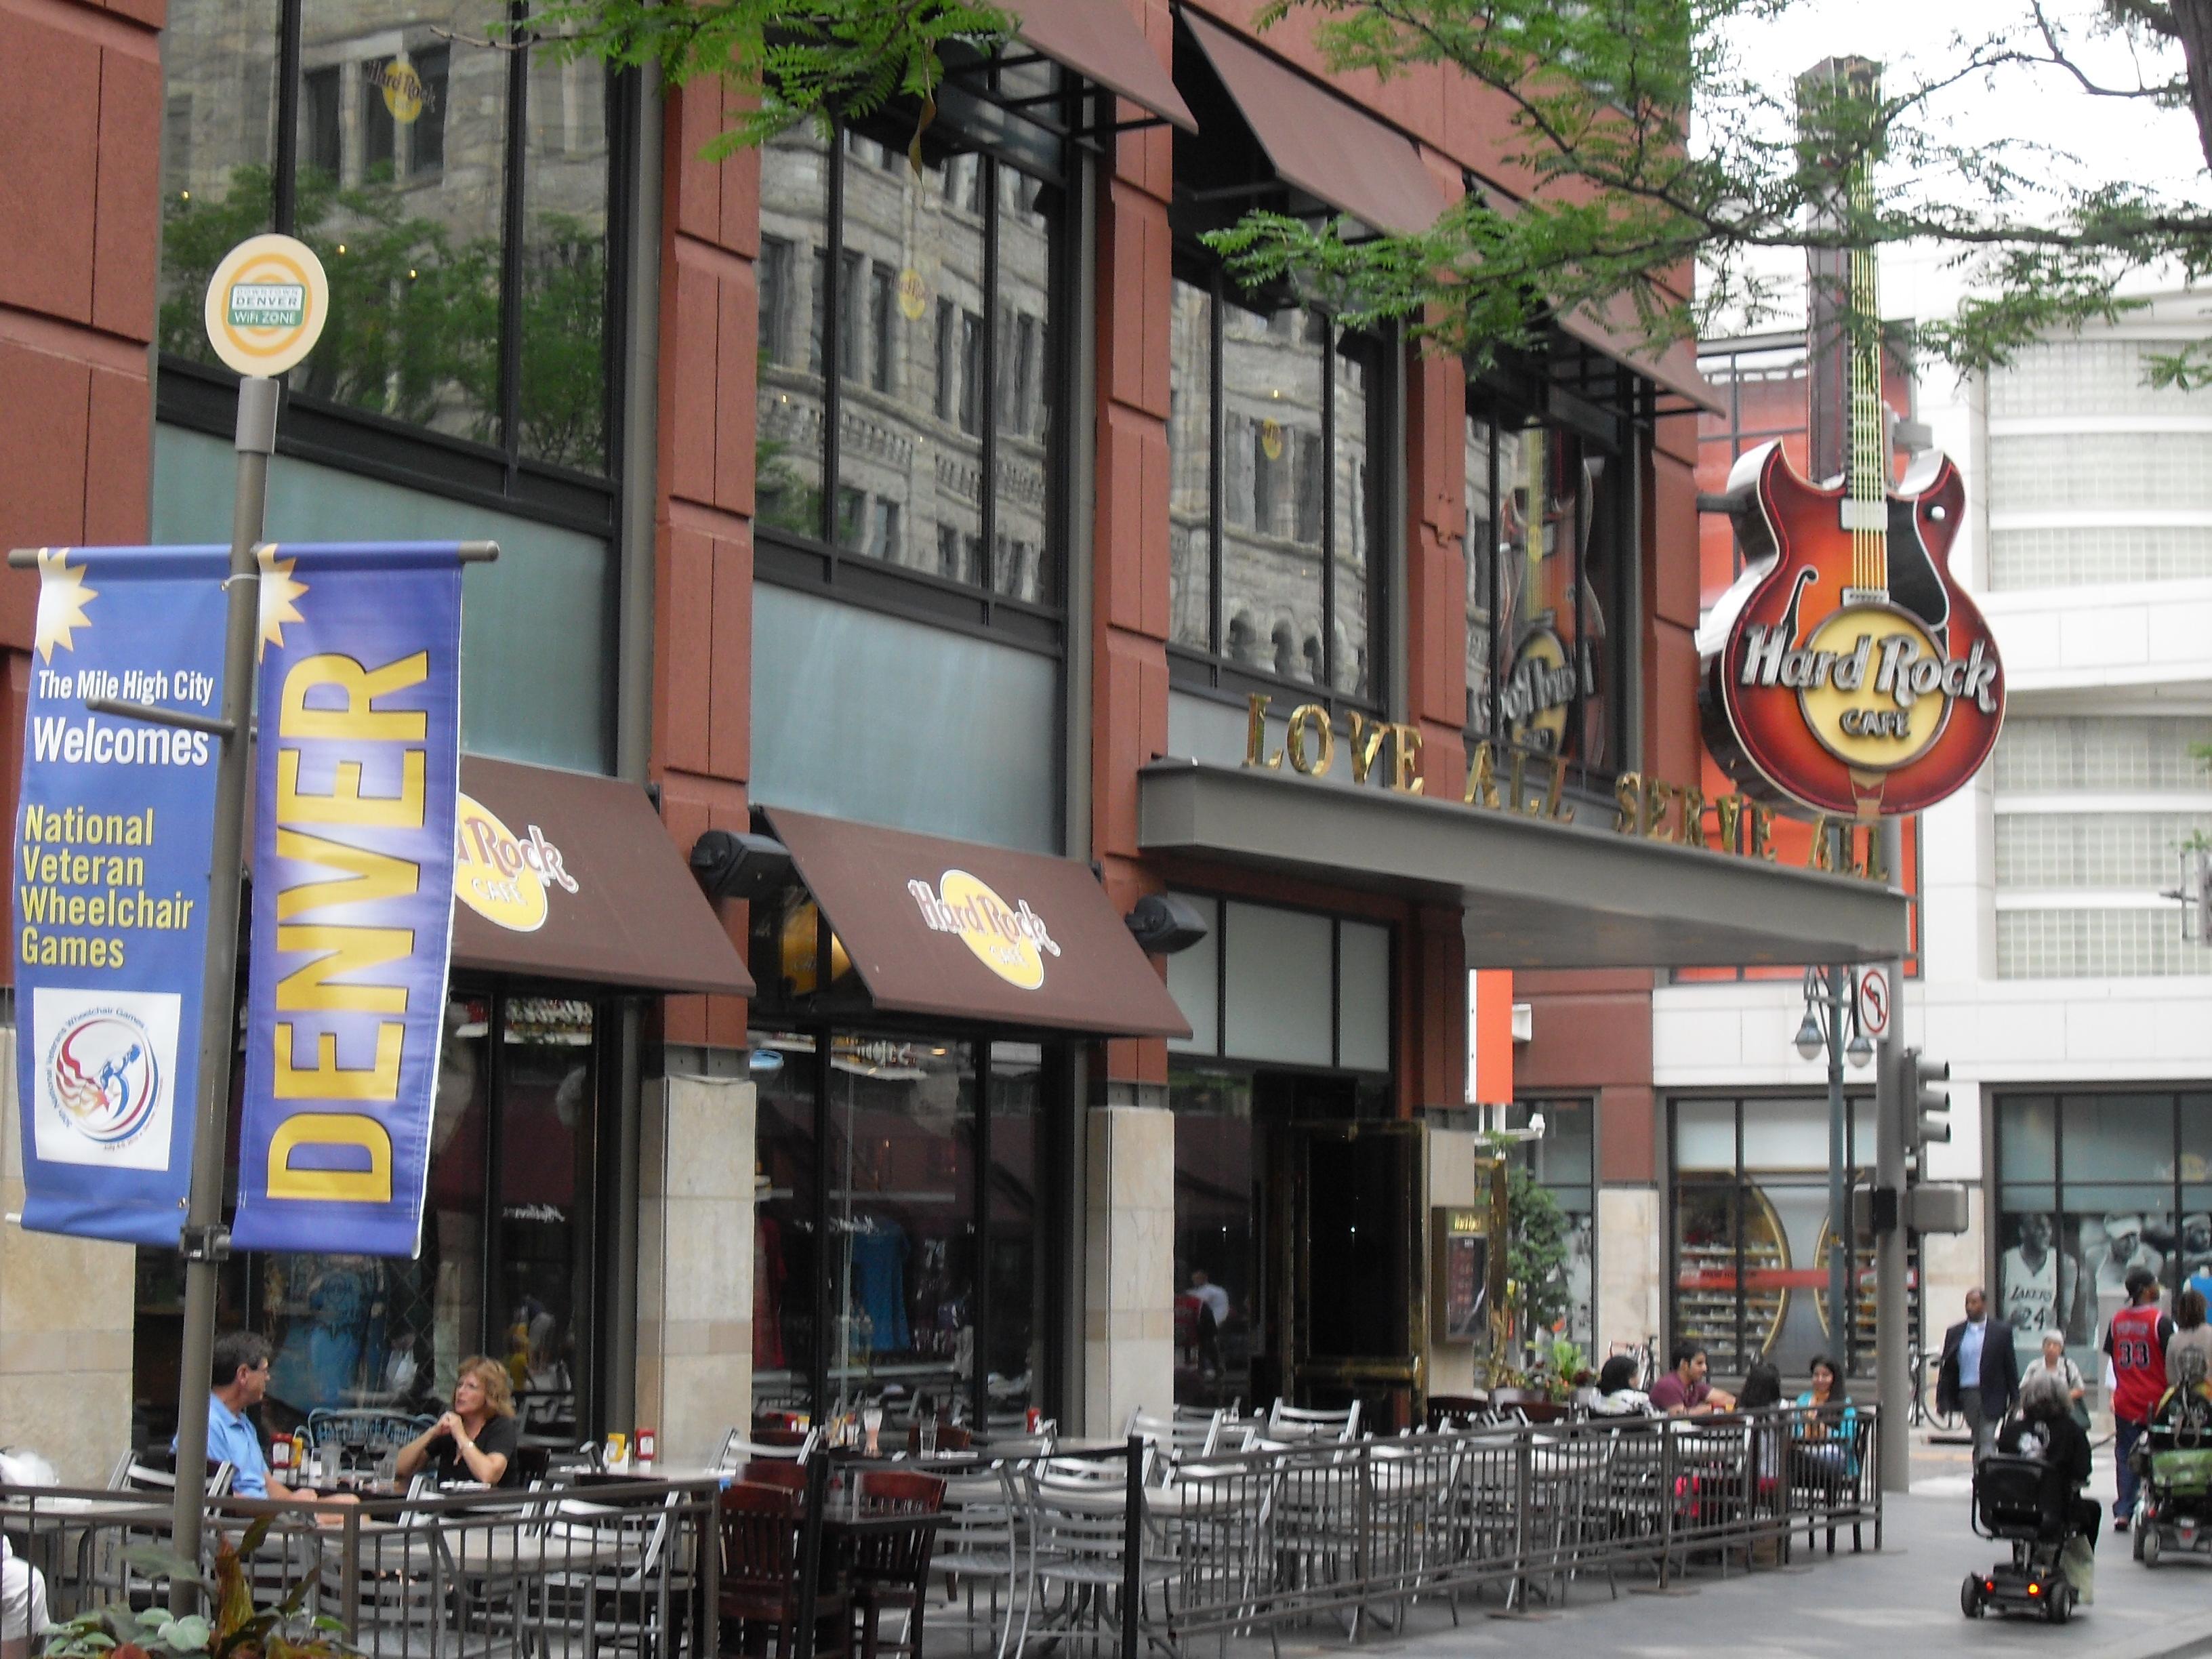 Http Www Hardrock Com Cafes Boston Menu